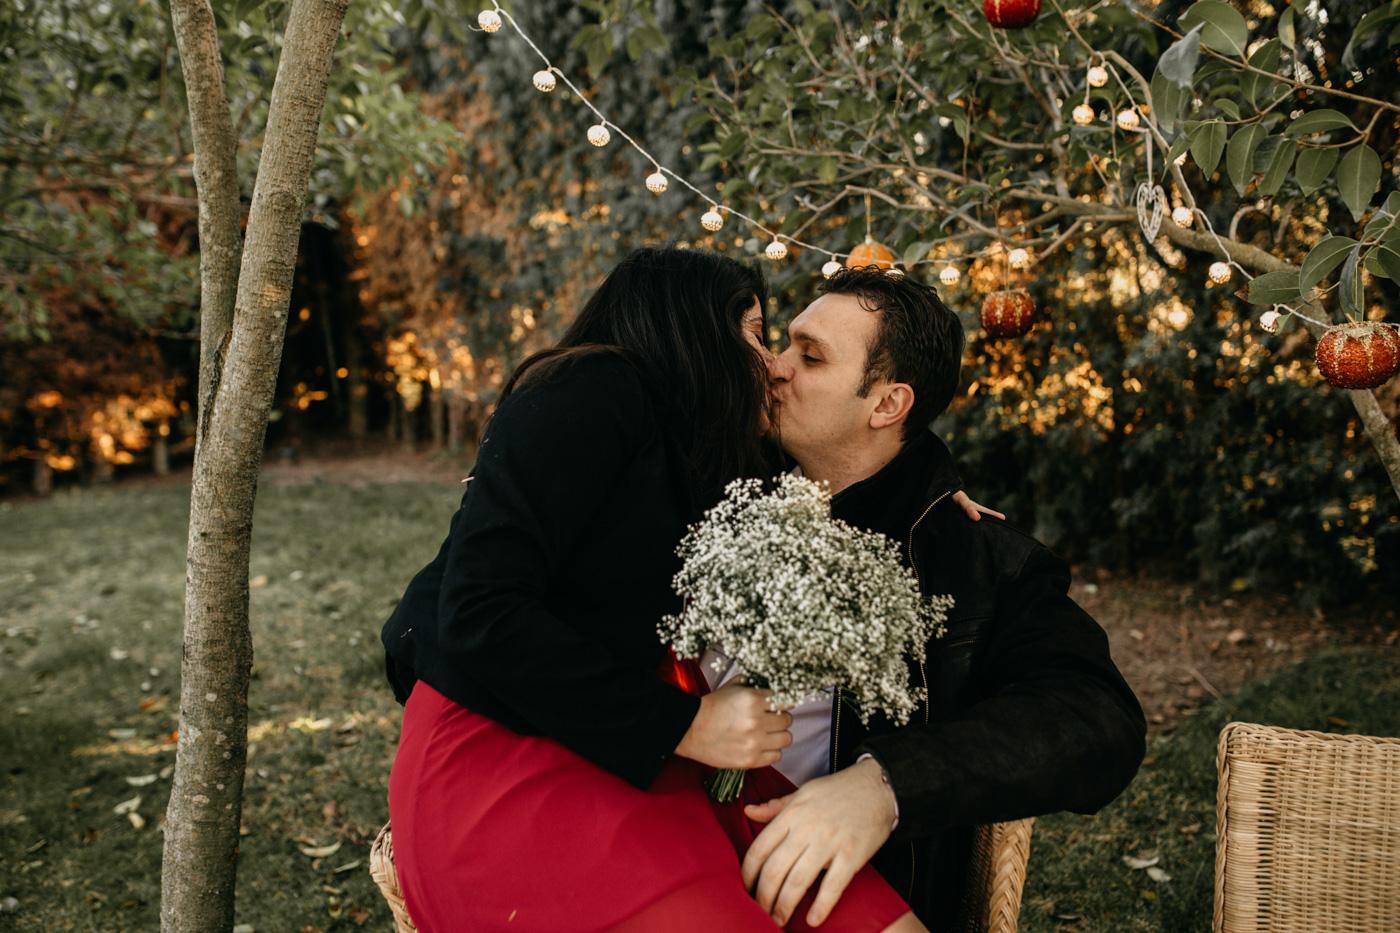 Velvet-Hush-fotografos-boda-al-aire-libre-madrid-081